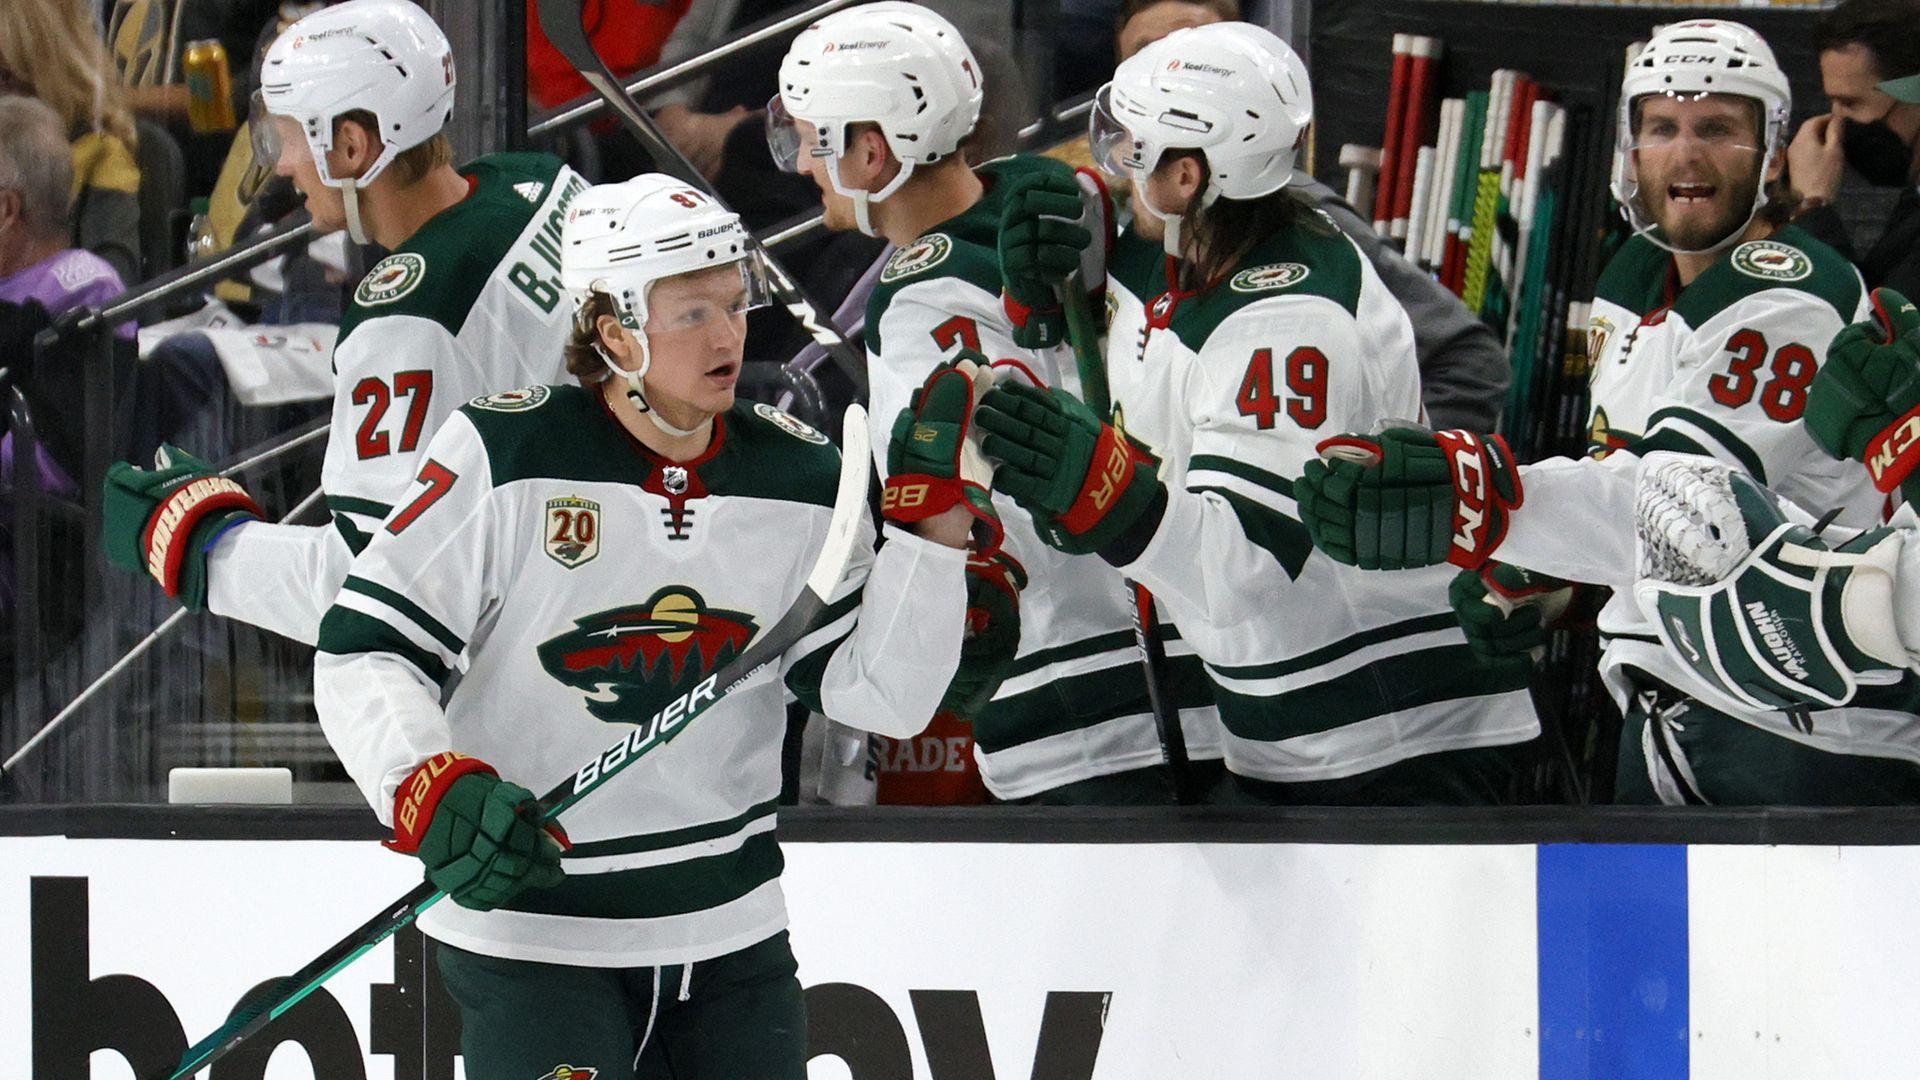 Minnesota Wild players high five on the ice.